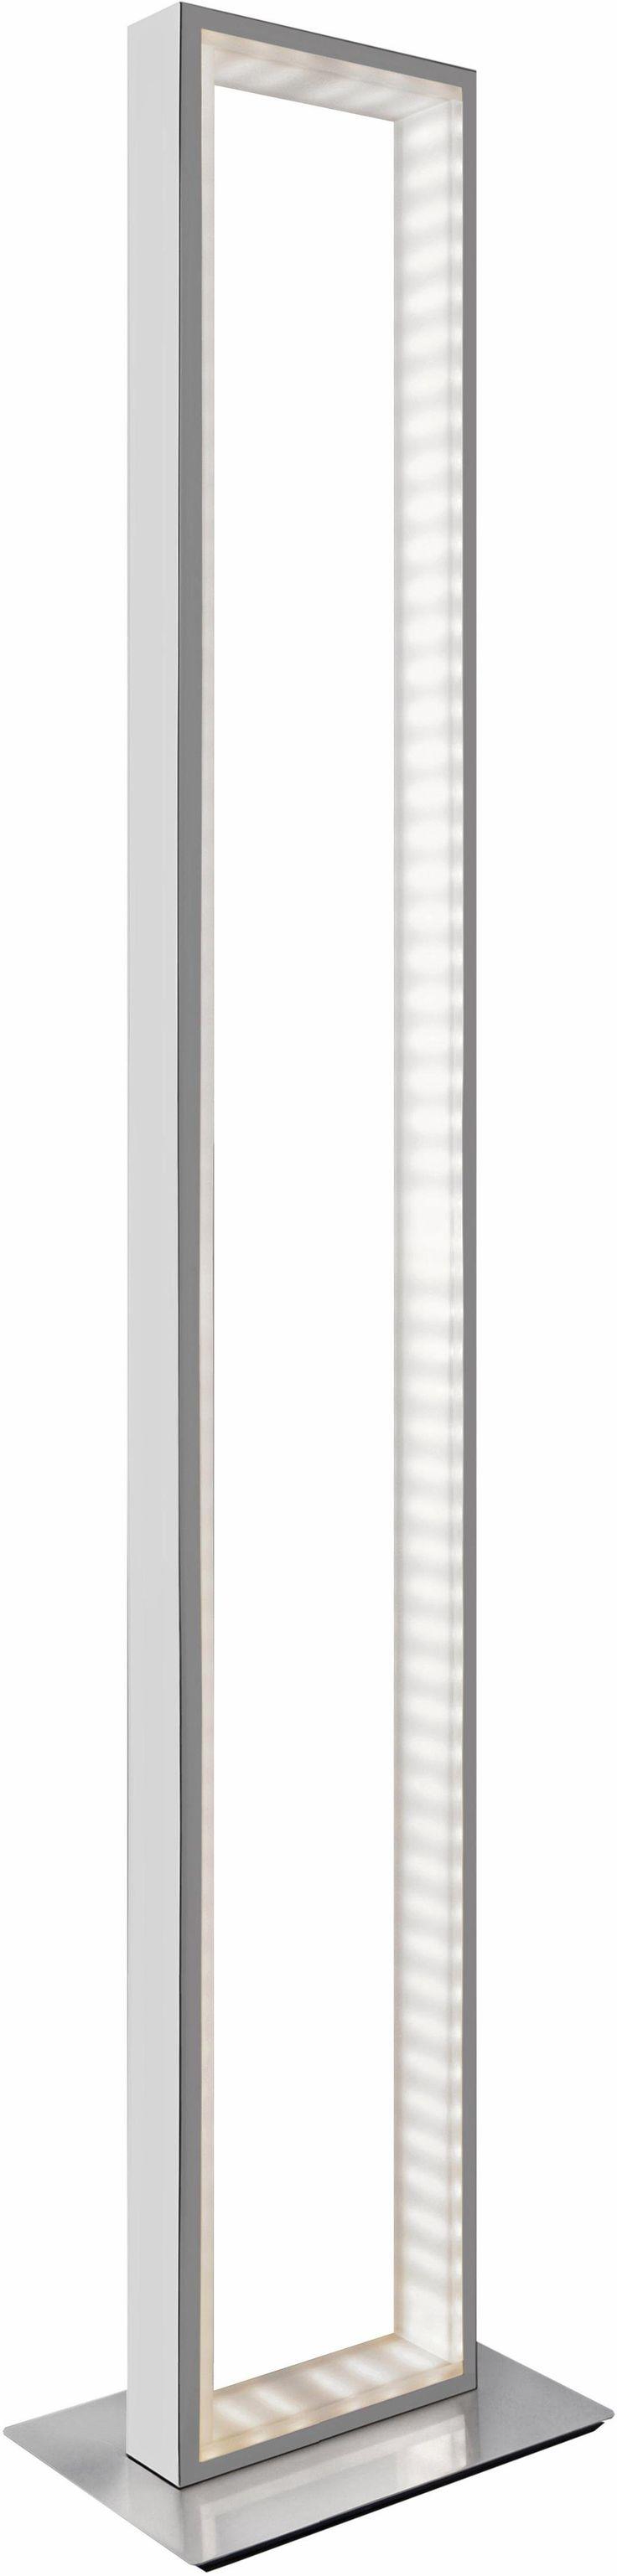 Sompex Stehlampe »OTTI« silber, Energieeffizienzklasse: A Jetzt bestellen unter: https://moebel.ladendirekt.de/lampen/stehlampen/standleuchten/?uid=753de30a-87c8-5e12-a9ca-19c3b3cc1c3f&utm_source=pinterest&utm_medium=pin&utm_campaign=boards #stehlampen #leuchten #lampen #stehlampe